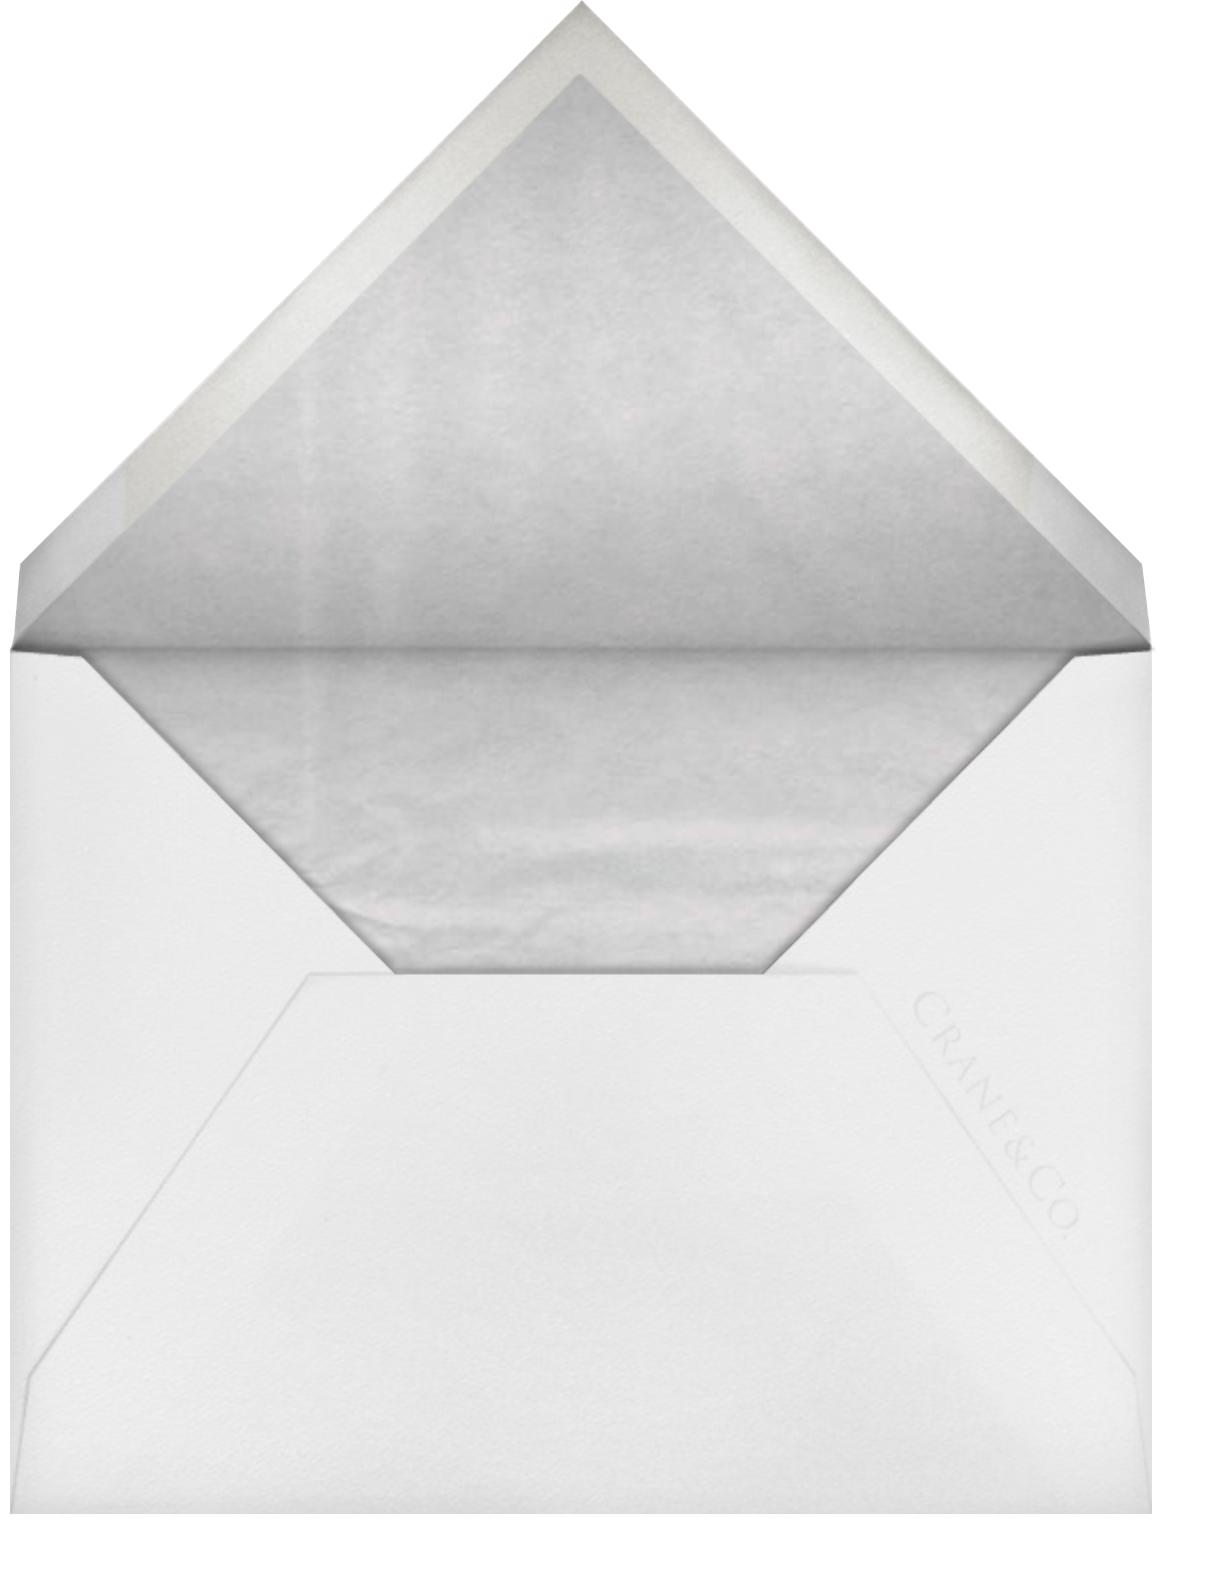 Amande - Newport Blue - Paperless Post - Envelope